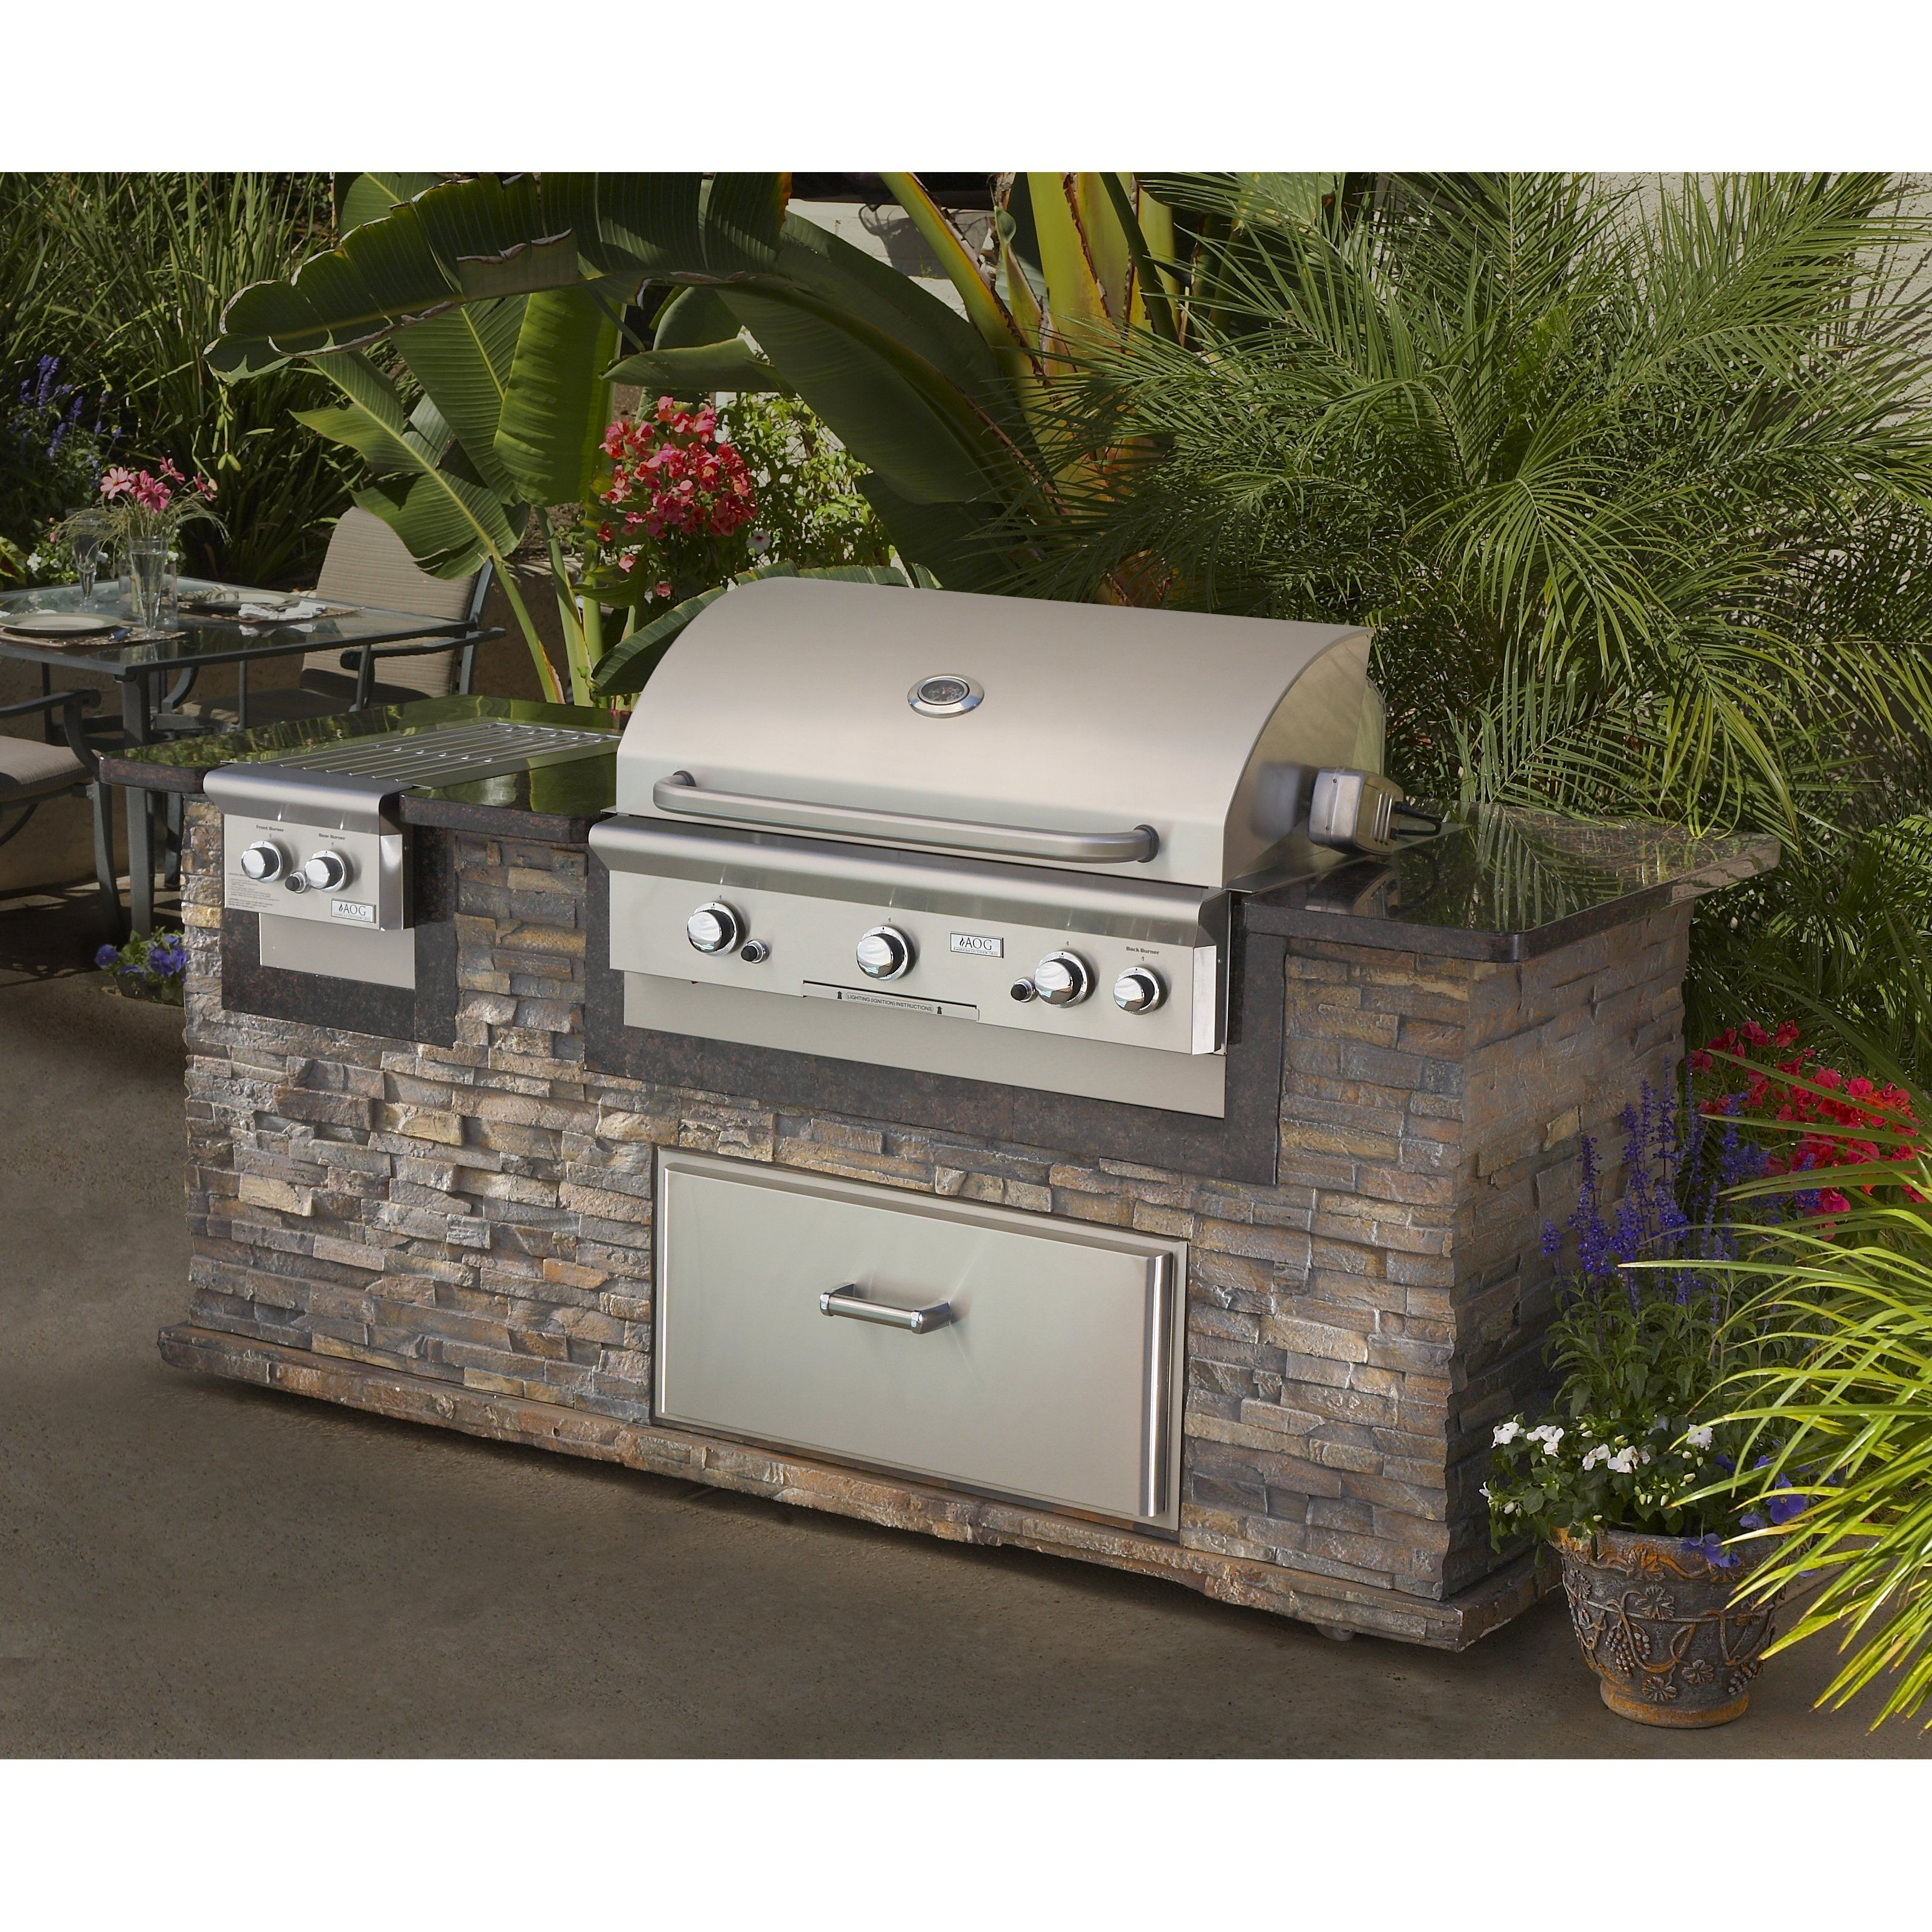 Backyard grill design idea outdoor kitchen island